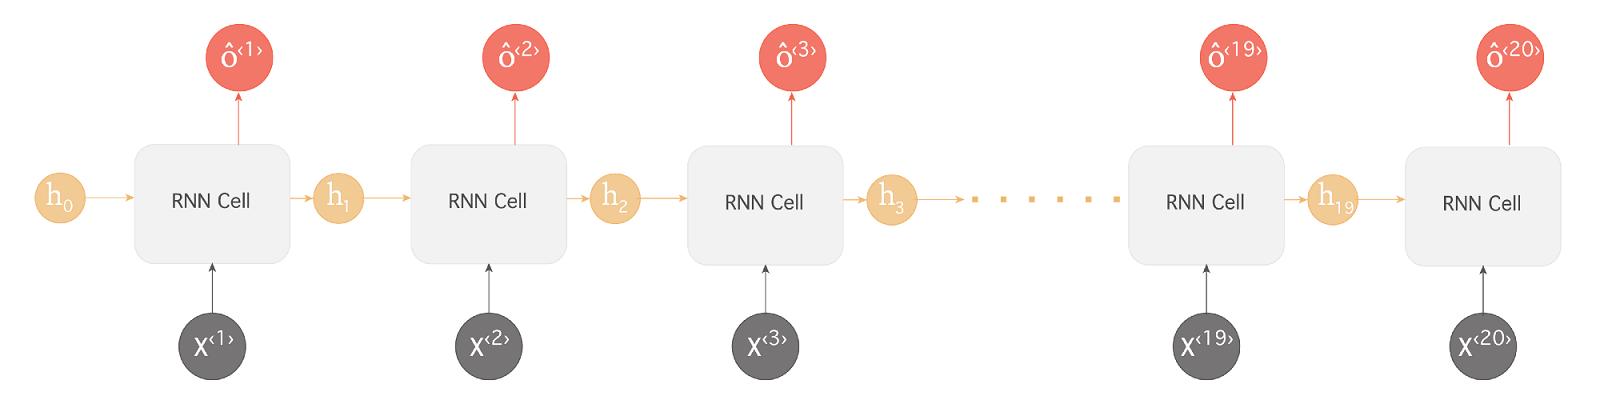 rnn_example_2